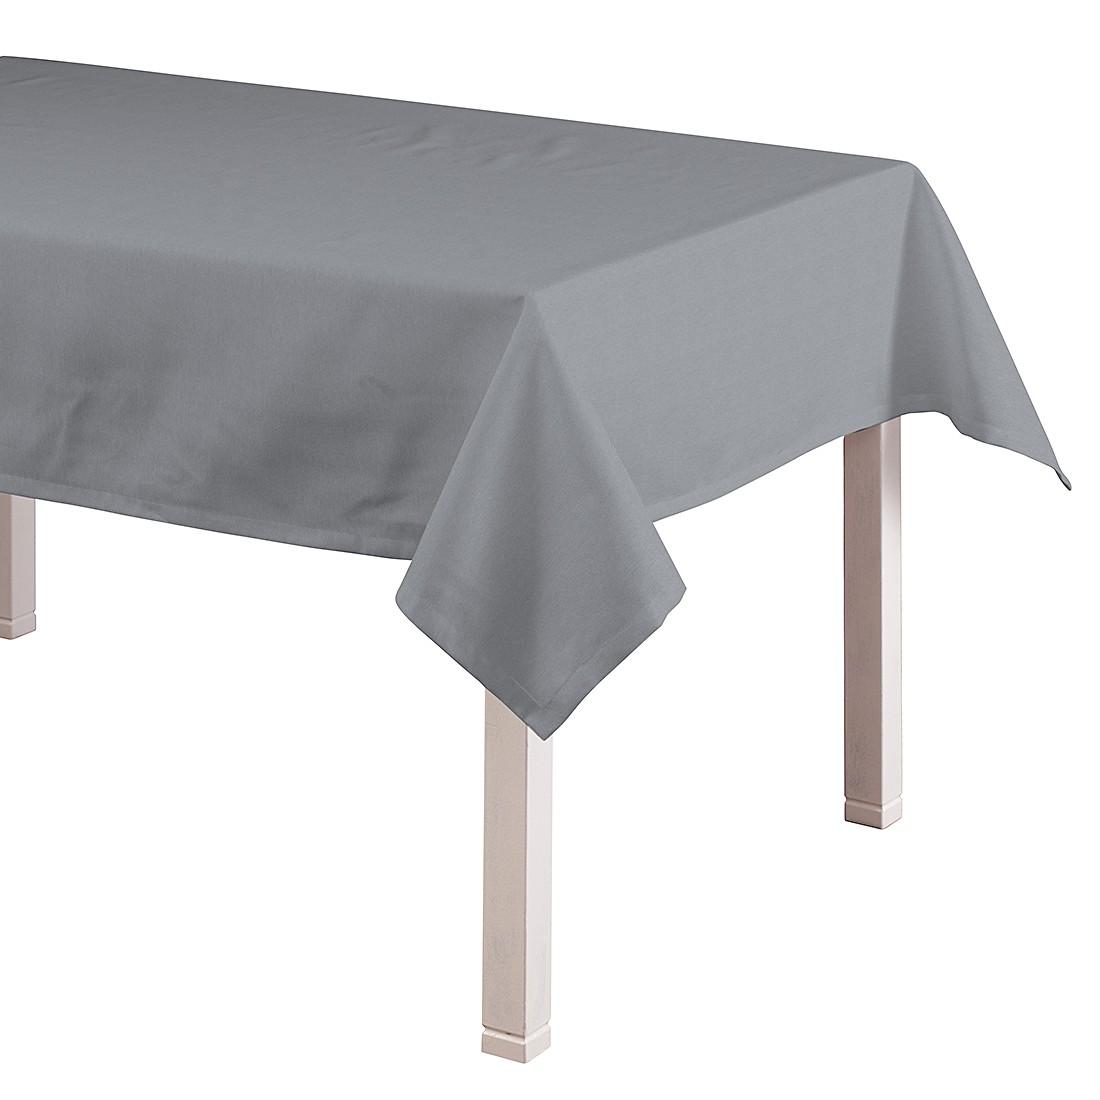 Tischdecke Atago – Grau – 130 x 280 cm, Dekoria jetzt bestellen